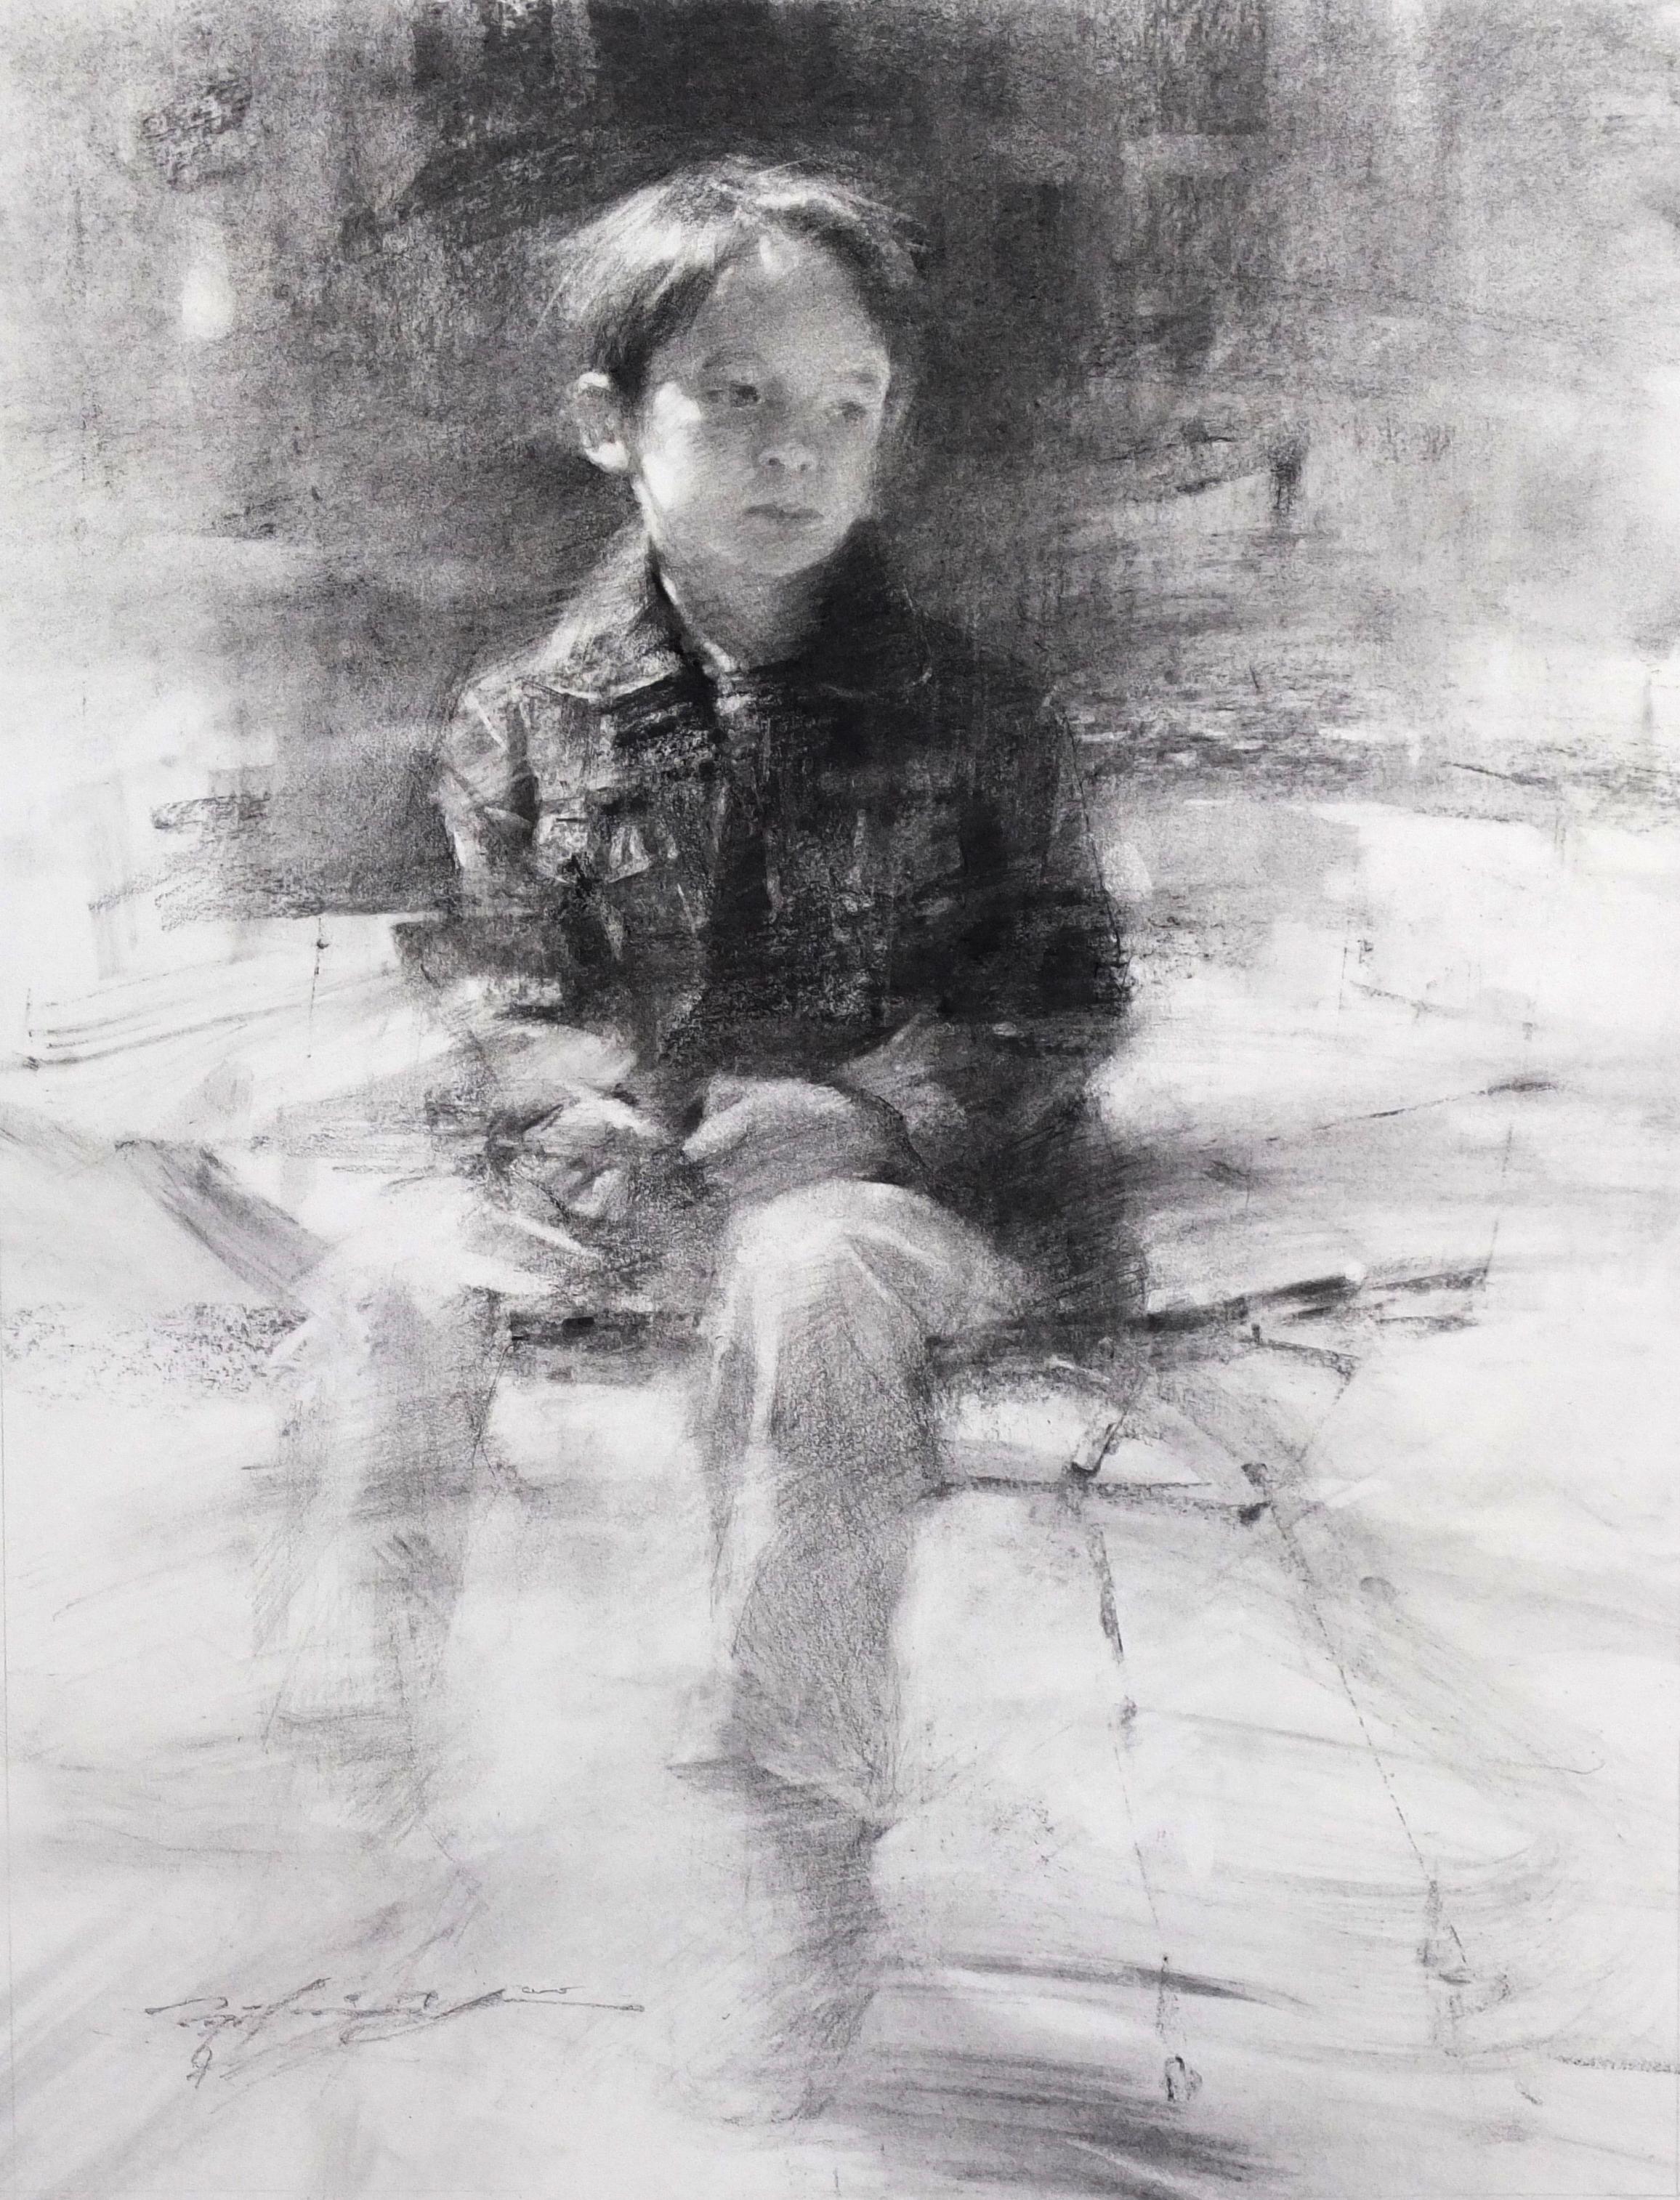 Kid with Denim Jacket